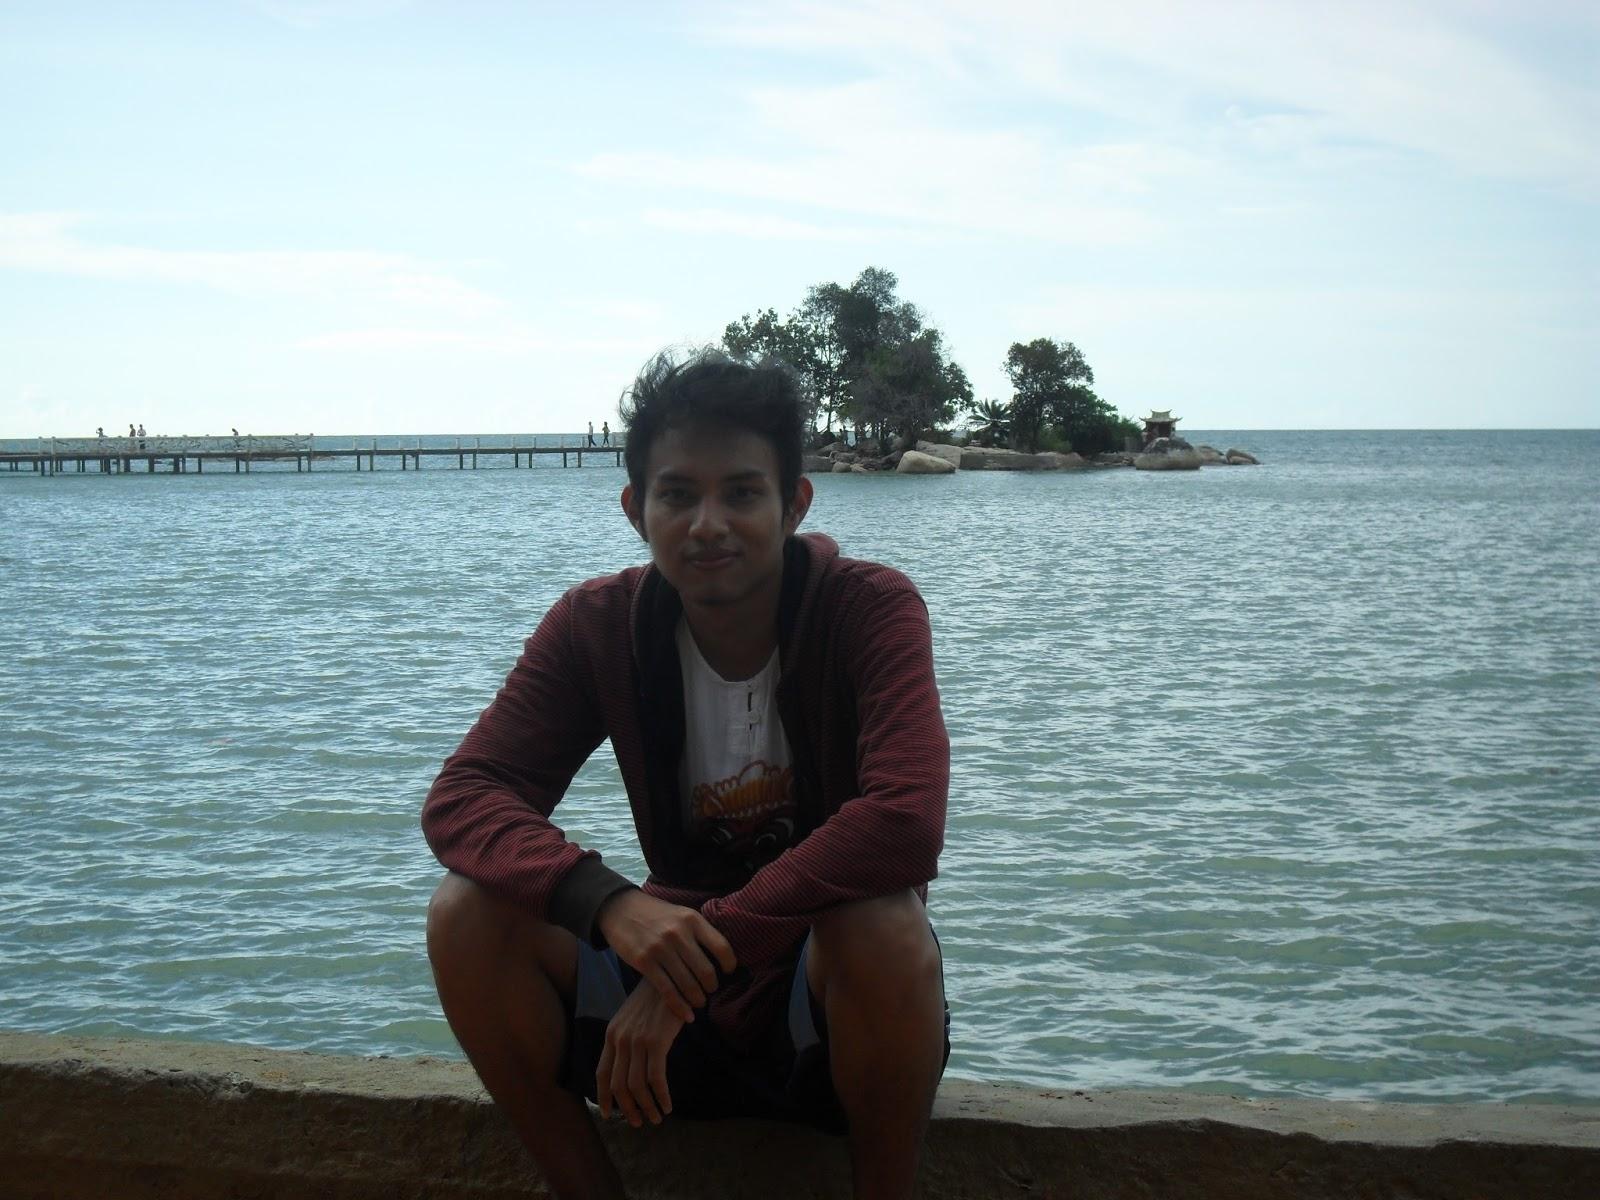 Quod Erat Demonstrandum West Borneo Part 4 The Weddingand A